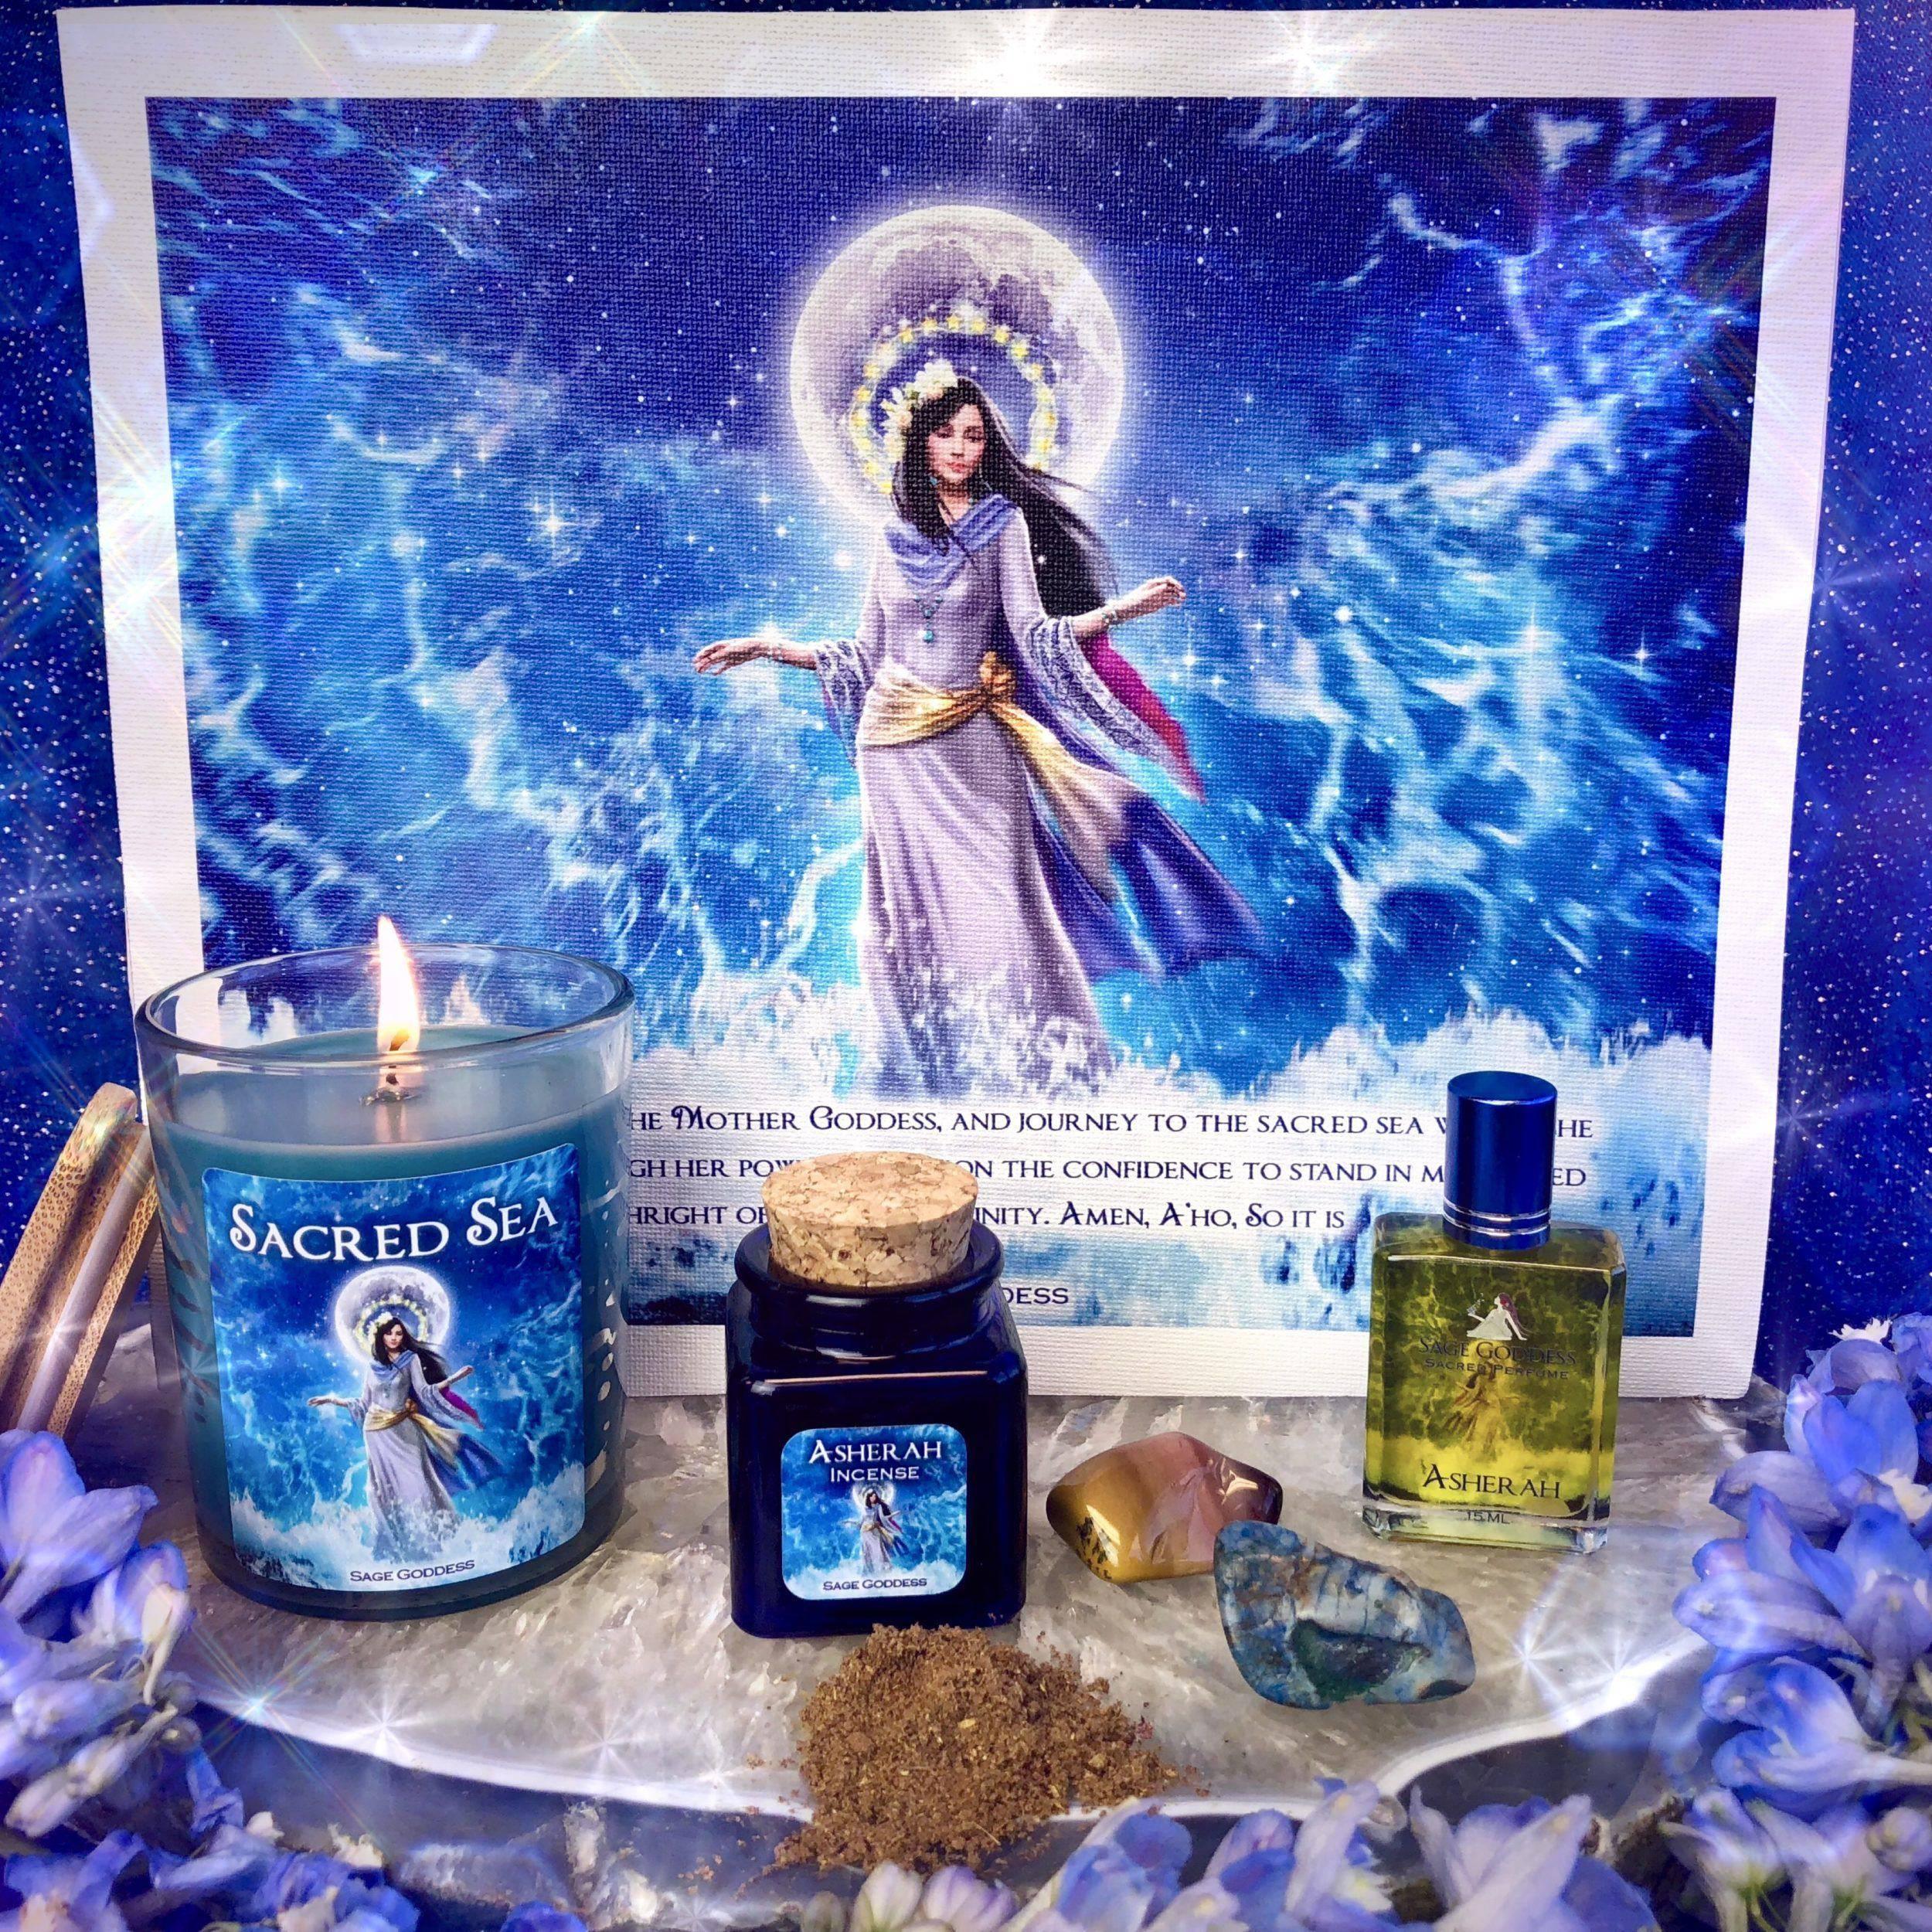 Full_Moon_Israel_Connection_Divine_Feminine_2of7_9_25Full_Moon_Israel_Connection_Divine_Feminine_2of7_9_25